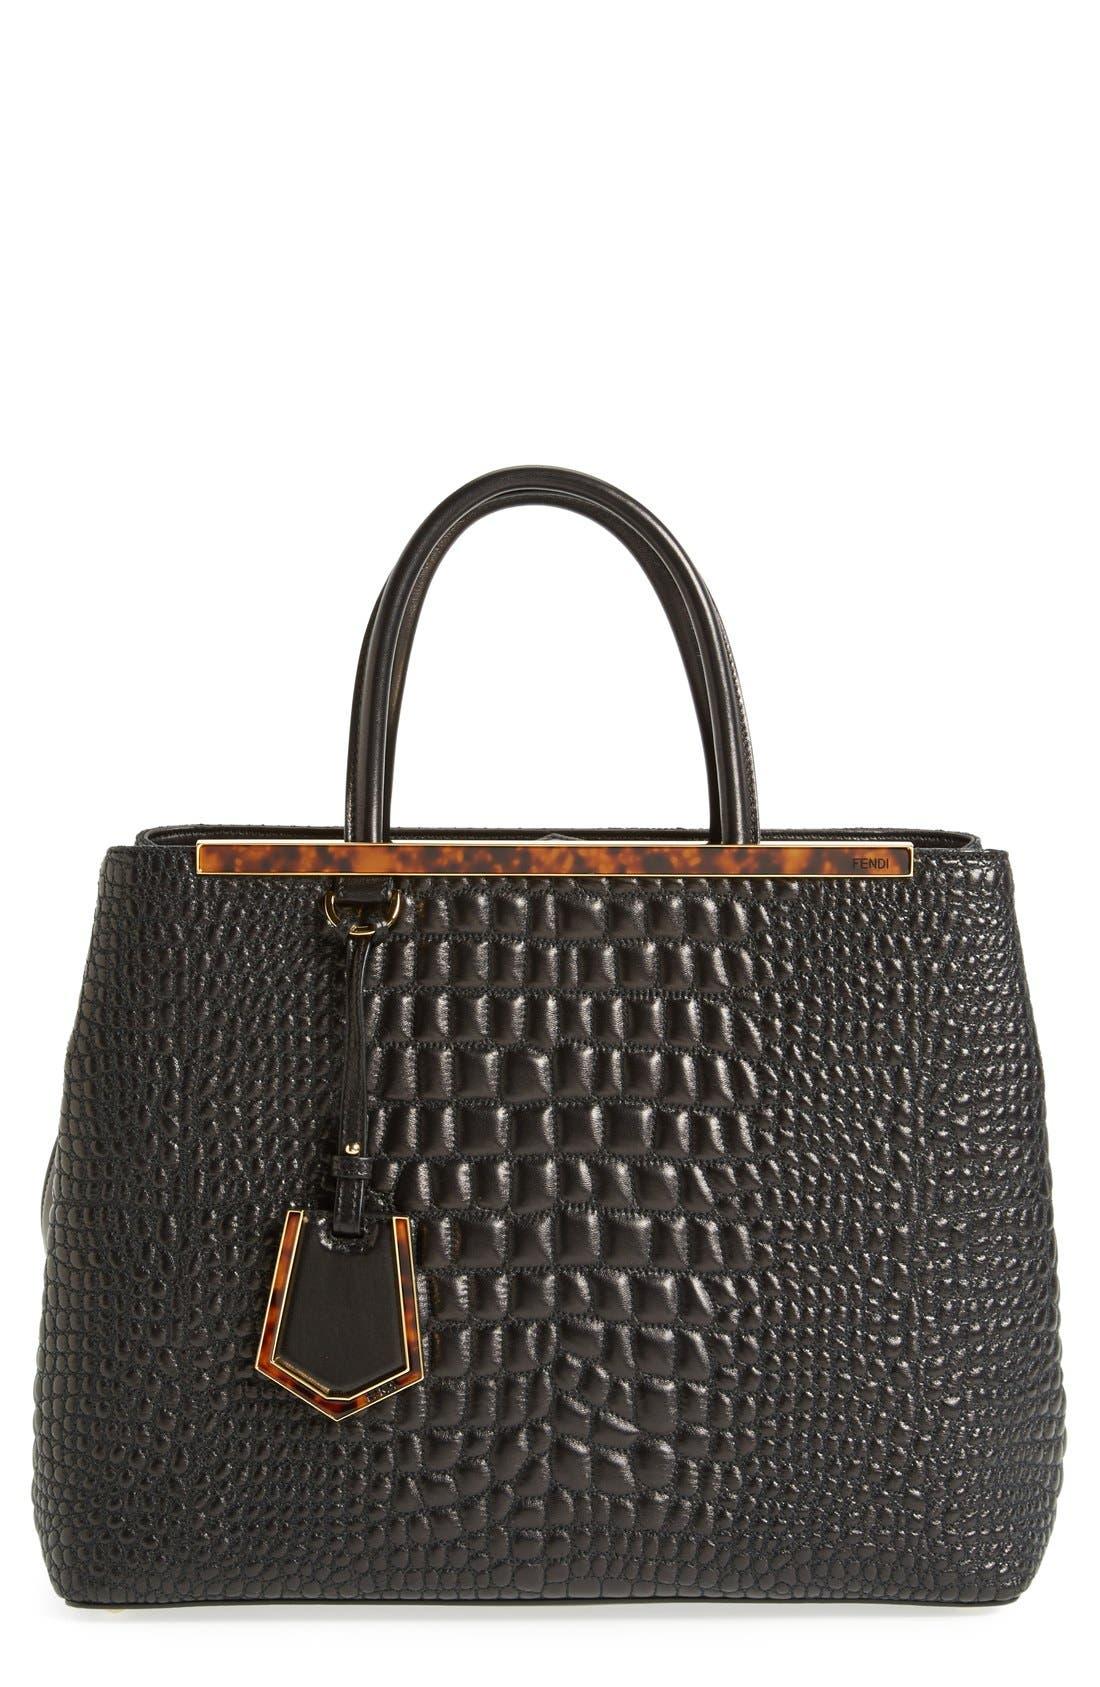 Main Image - Fendi 'Medium 2Jours' Croc Embroidered Leather Shopper